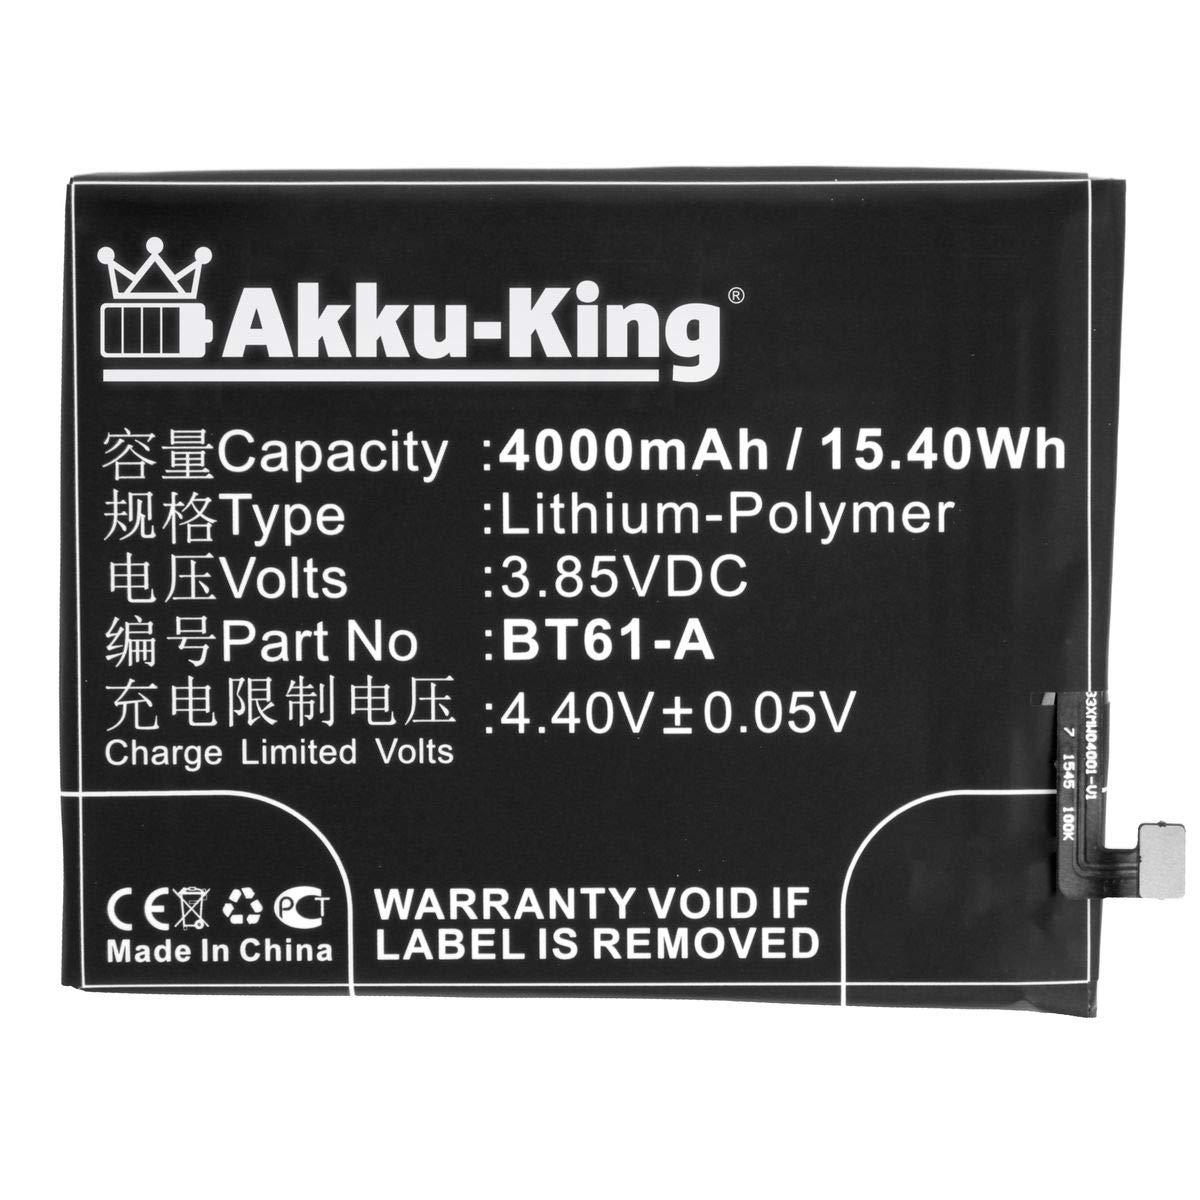 Akku-King Batería para Meizu M3 Note, M3 Note Dual SIM, M3 ...